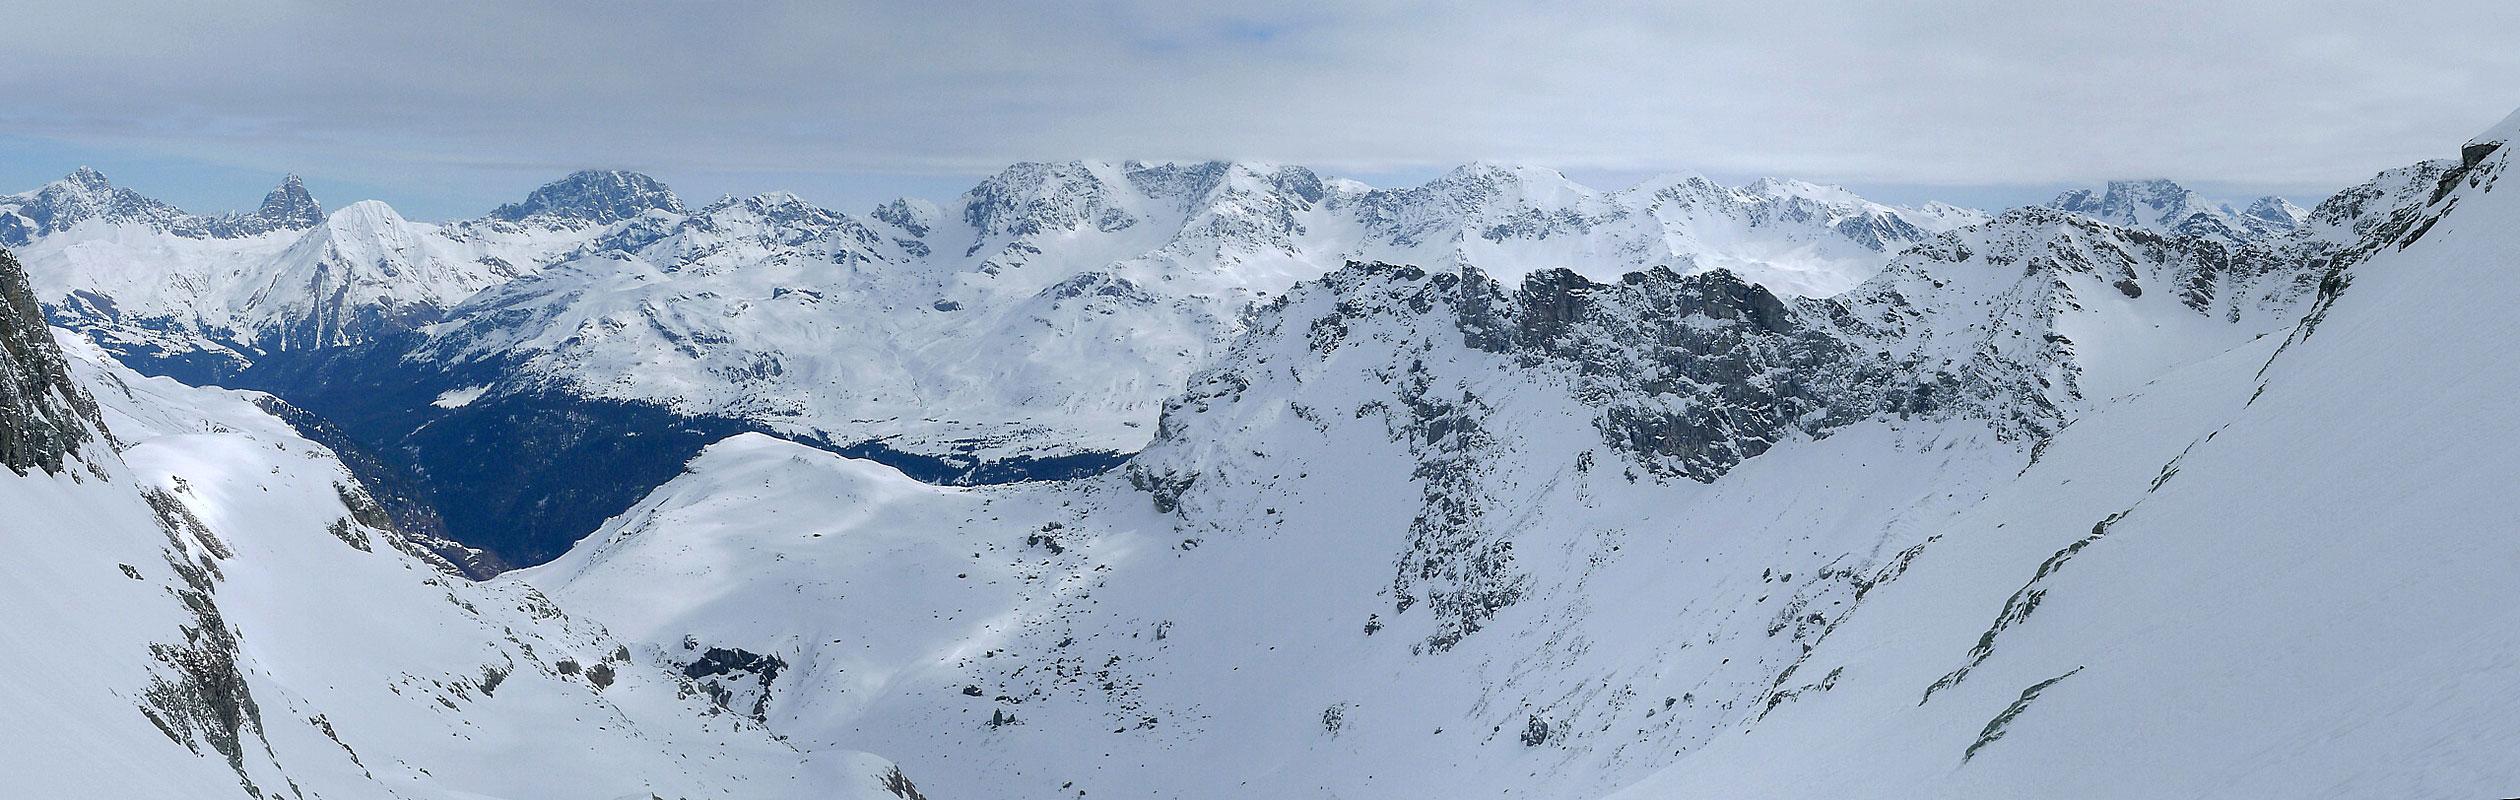 Piz Platta Plattagruppe / Oberhalbstein Switzerland panorama 31